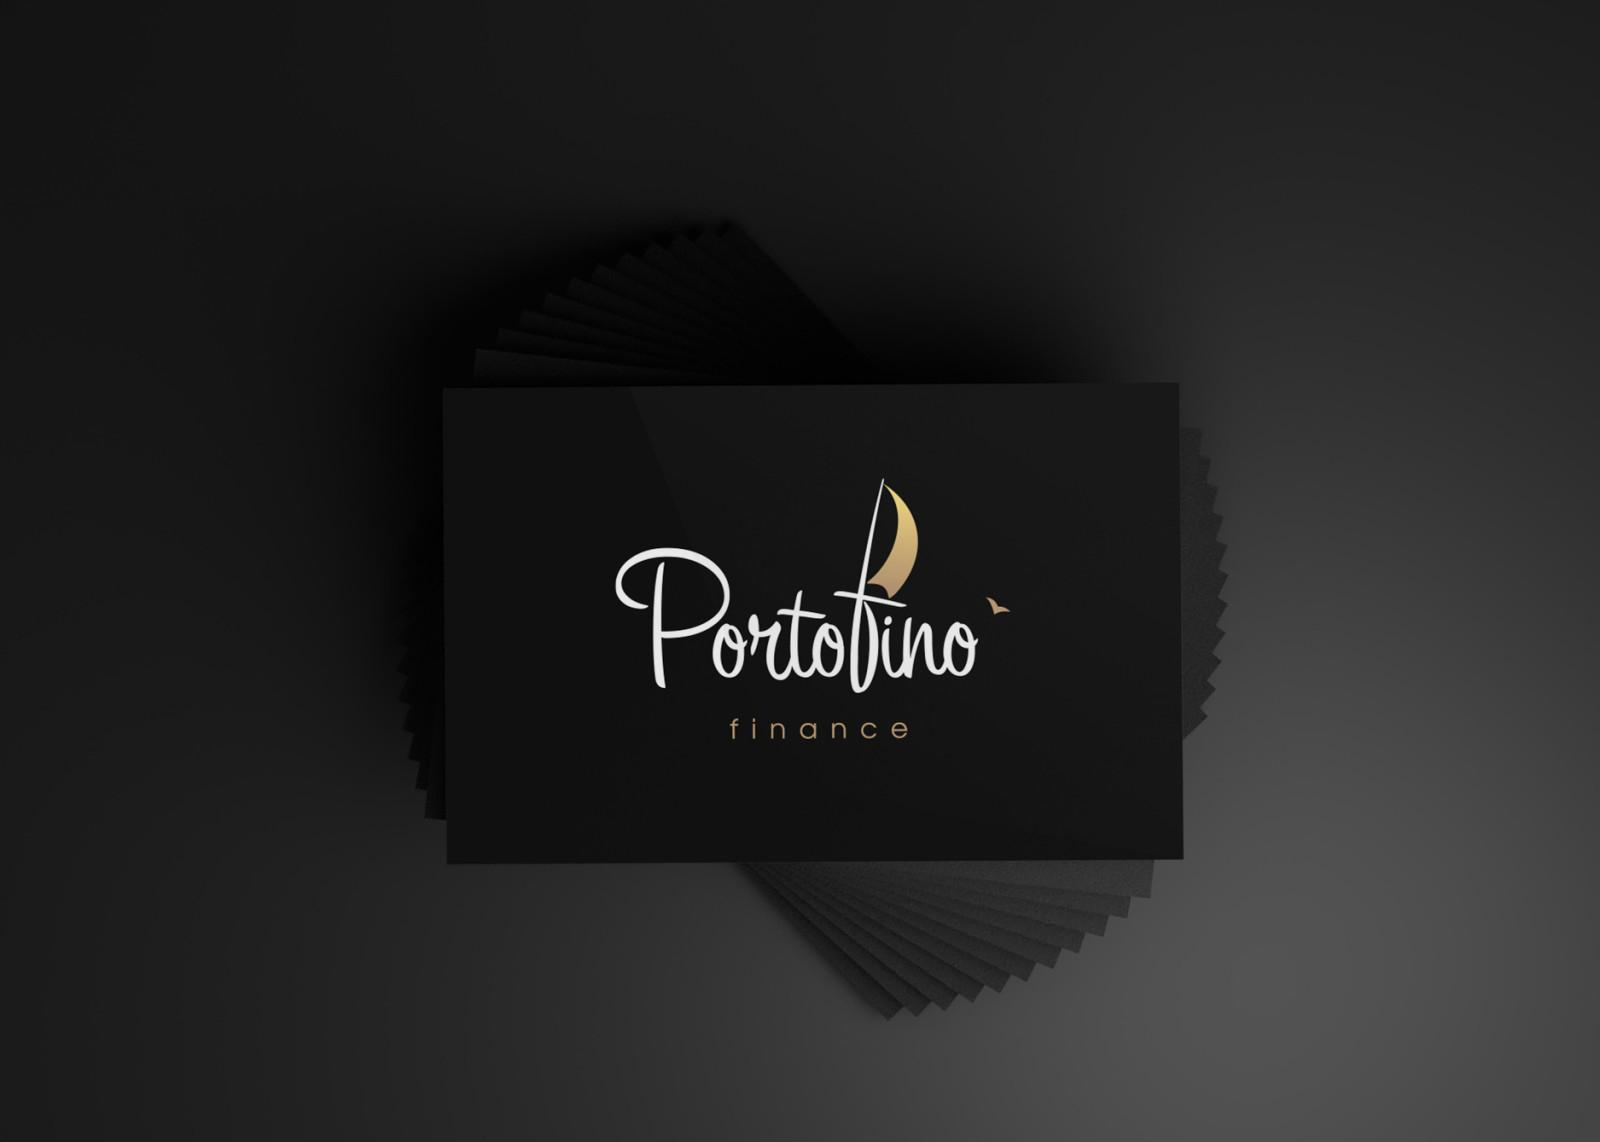 Визуализация логотипа Portofino на визитке